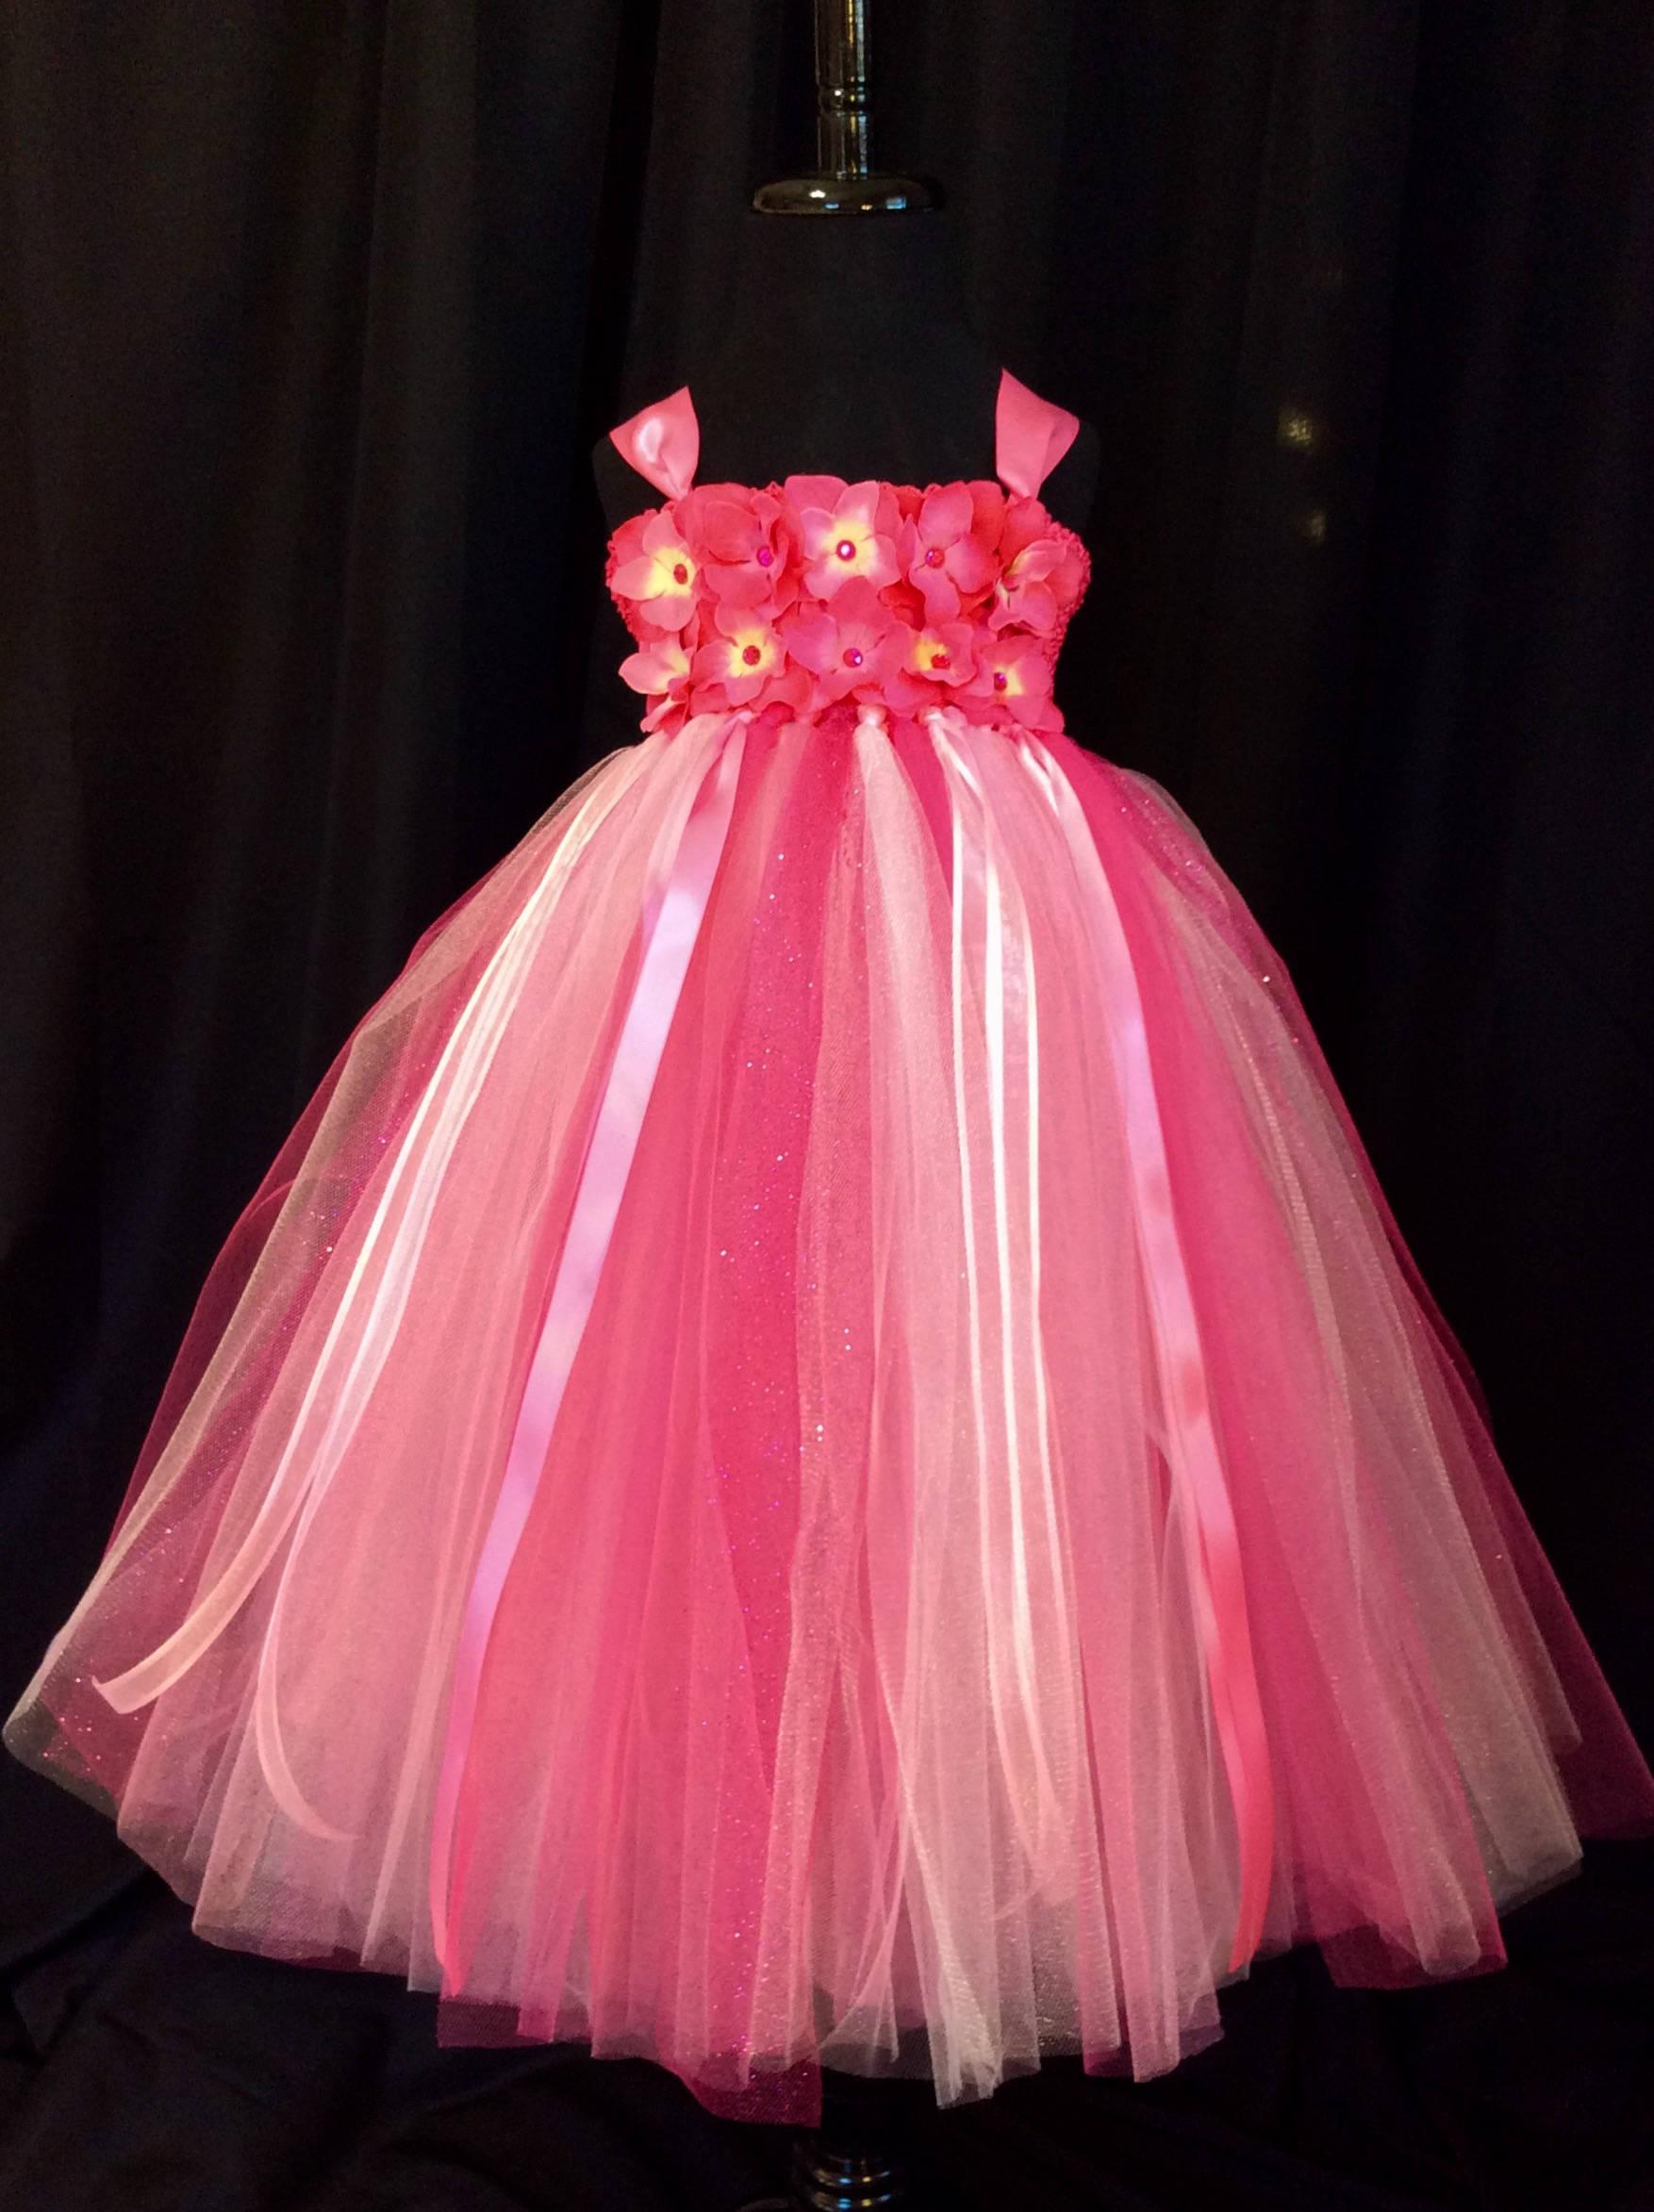 Bright pink flower girl dress tulle flower girl dress tutu dress bright pink flower girl dress tulle flower girl dress tutu dress for girls tutu flower girl dress wedding pink flower girl dress mightylinksfo Gallery